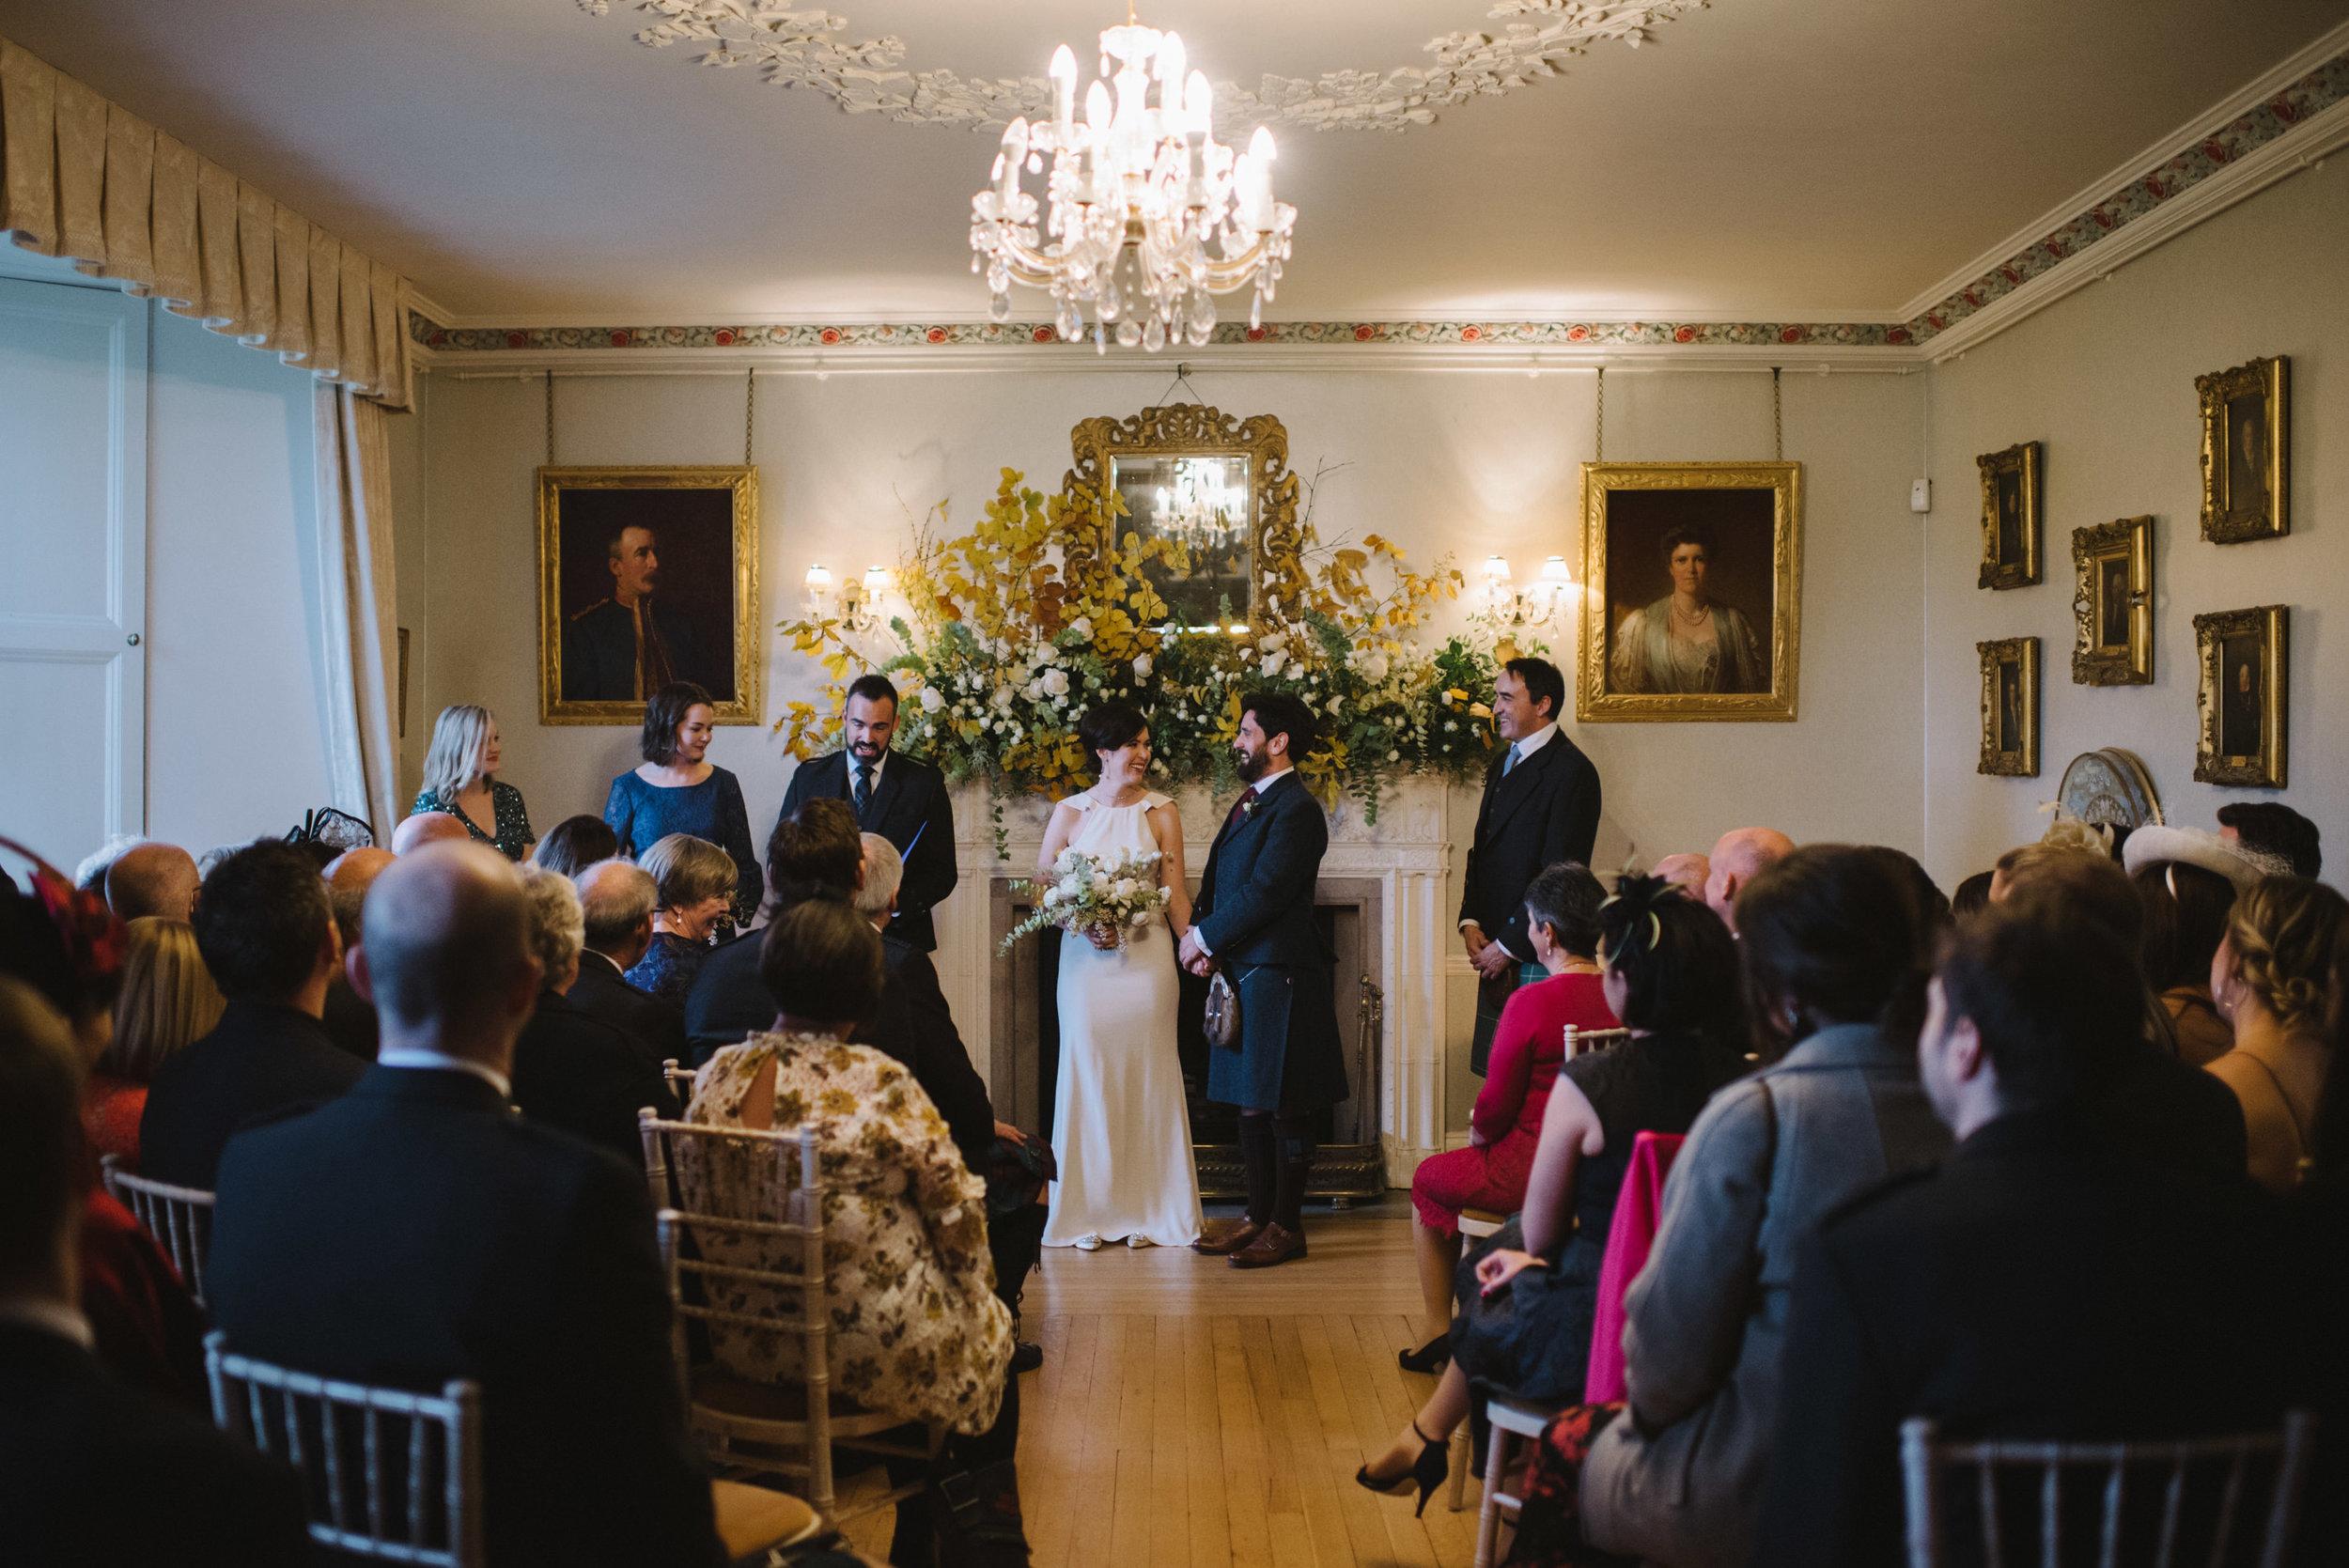 0175-LISA-DEVINE-PHOTOGRAPHY-ALTERNATIVE-WEDDING-PHOTOGRAPHY-SCOTLAND-DESTINATION-WEDDINGS-GLASGOW-WEDDINGS-COOL-WEDDINGS-STYLISH-WEDDINGS.JPG